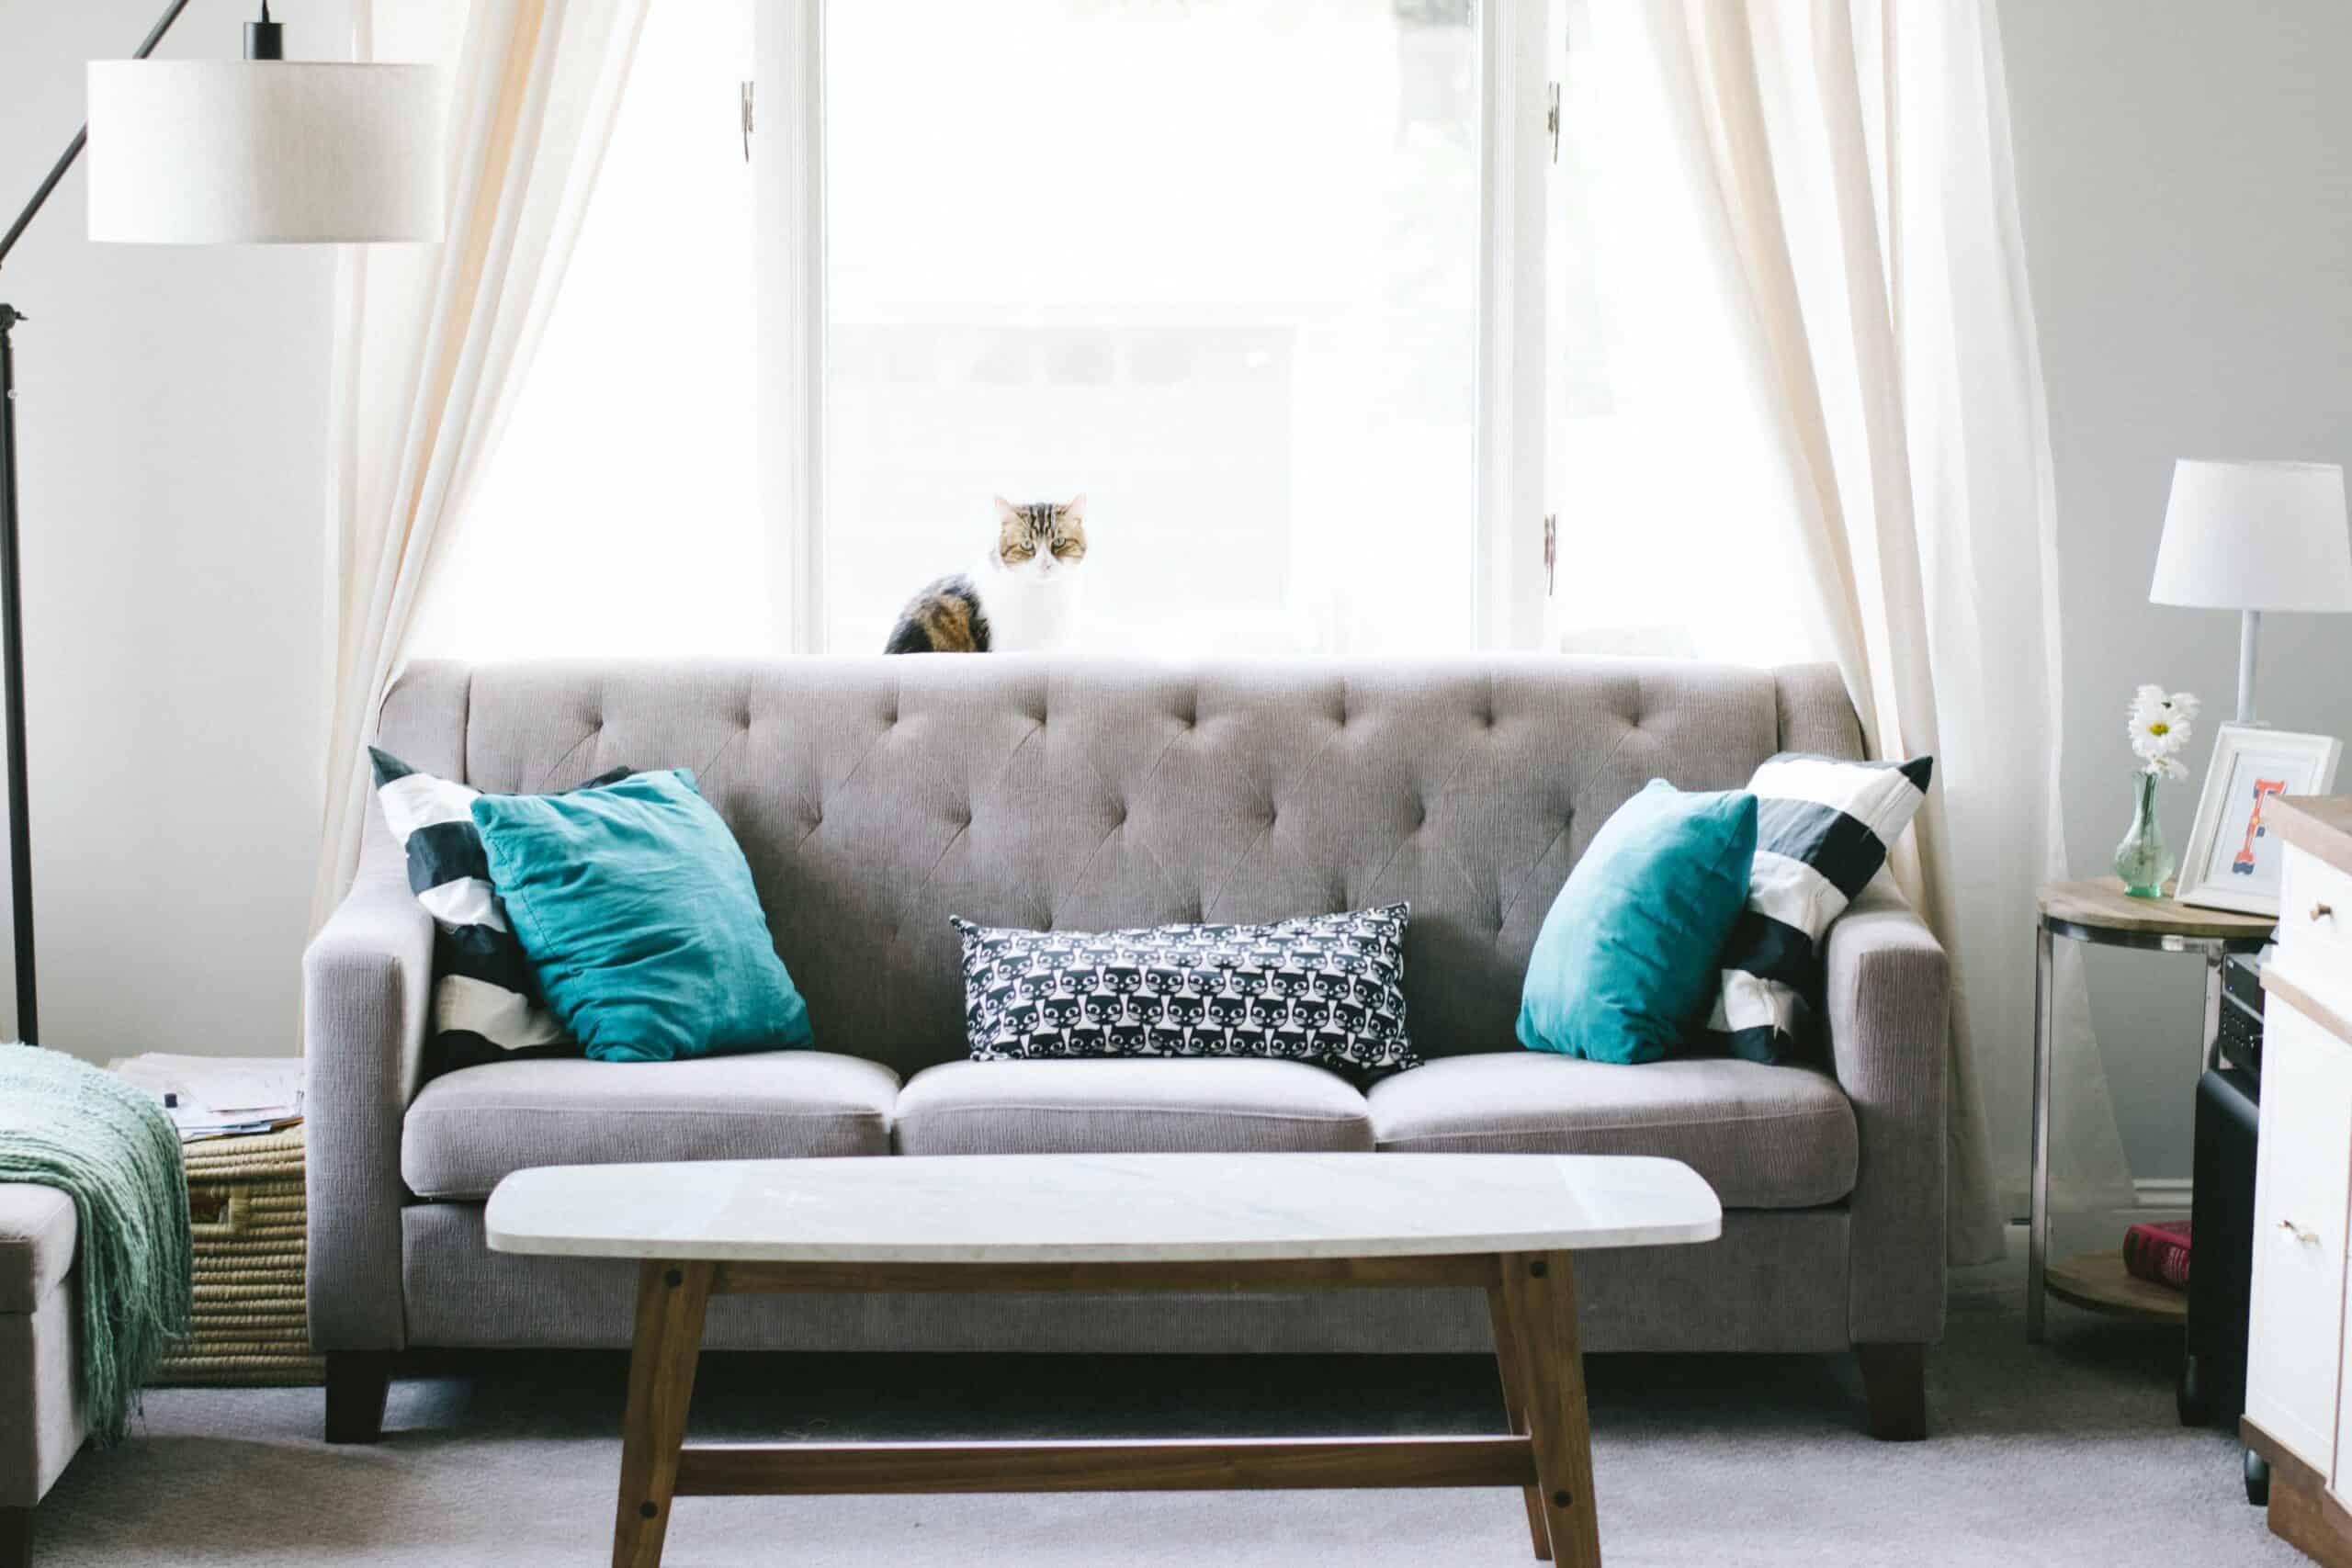 digital marketing for Furniture Repair Services